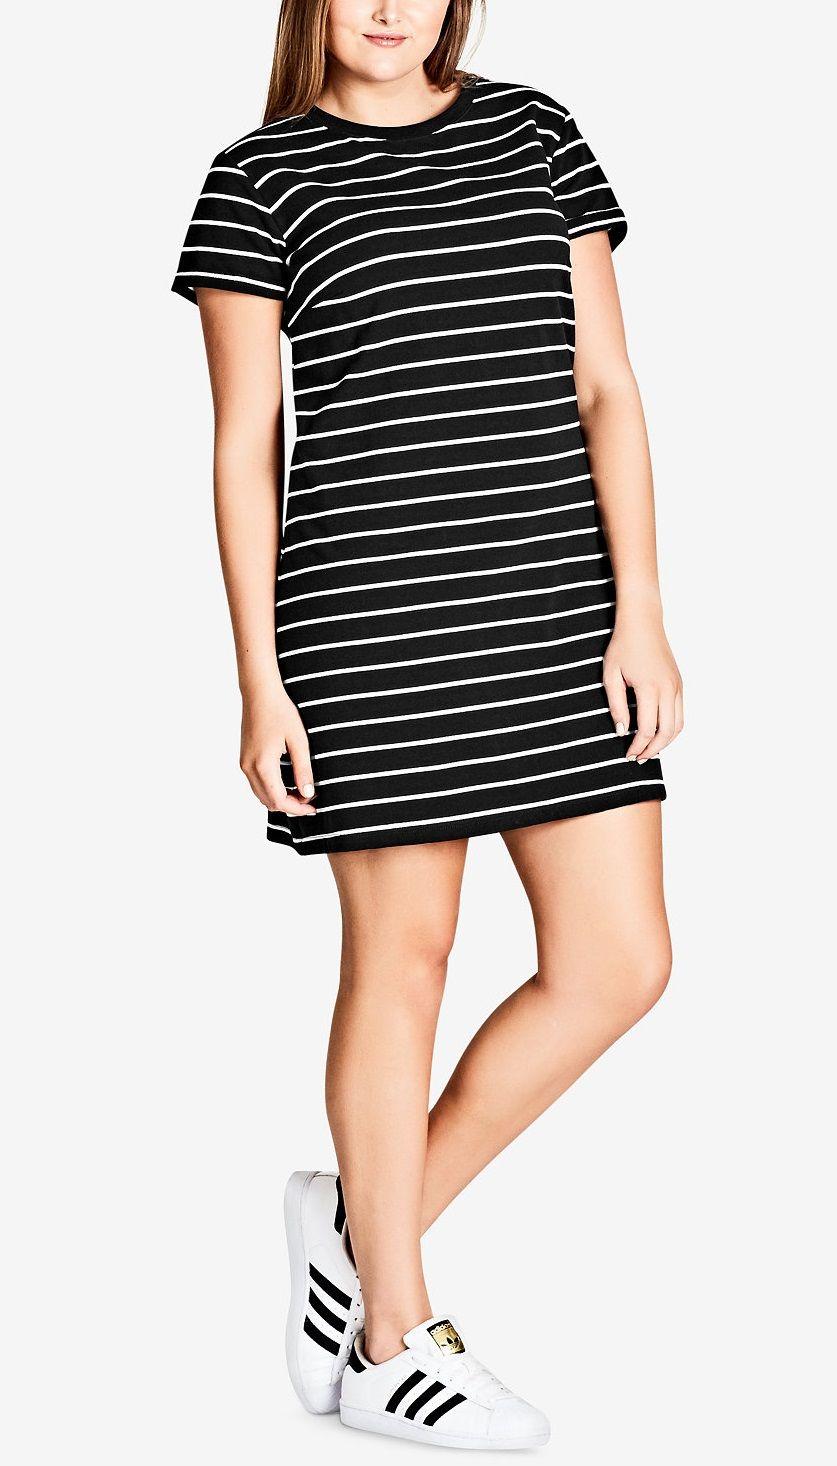 release date official 2019 best Plus Size Striped T-Shirt Dress   Plus Size Fashion ...